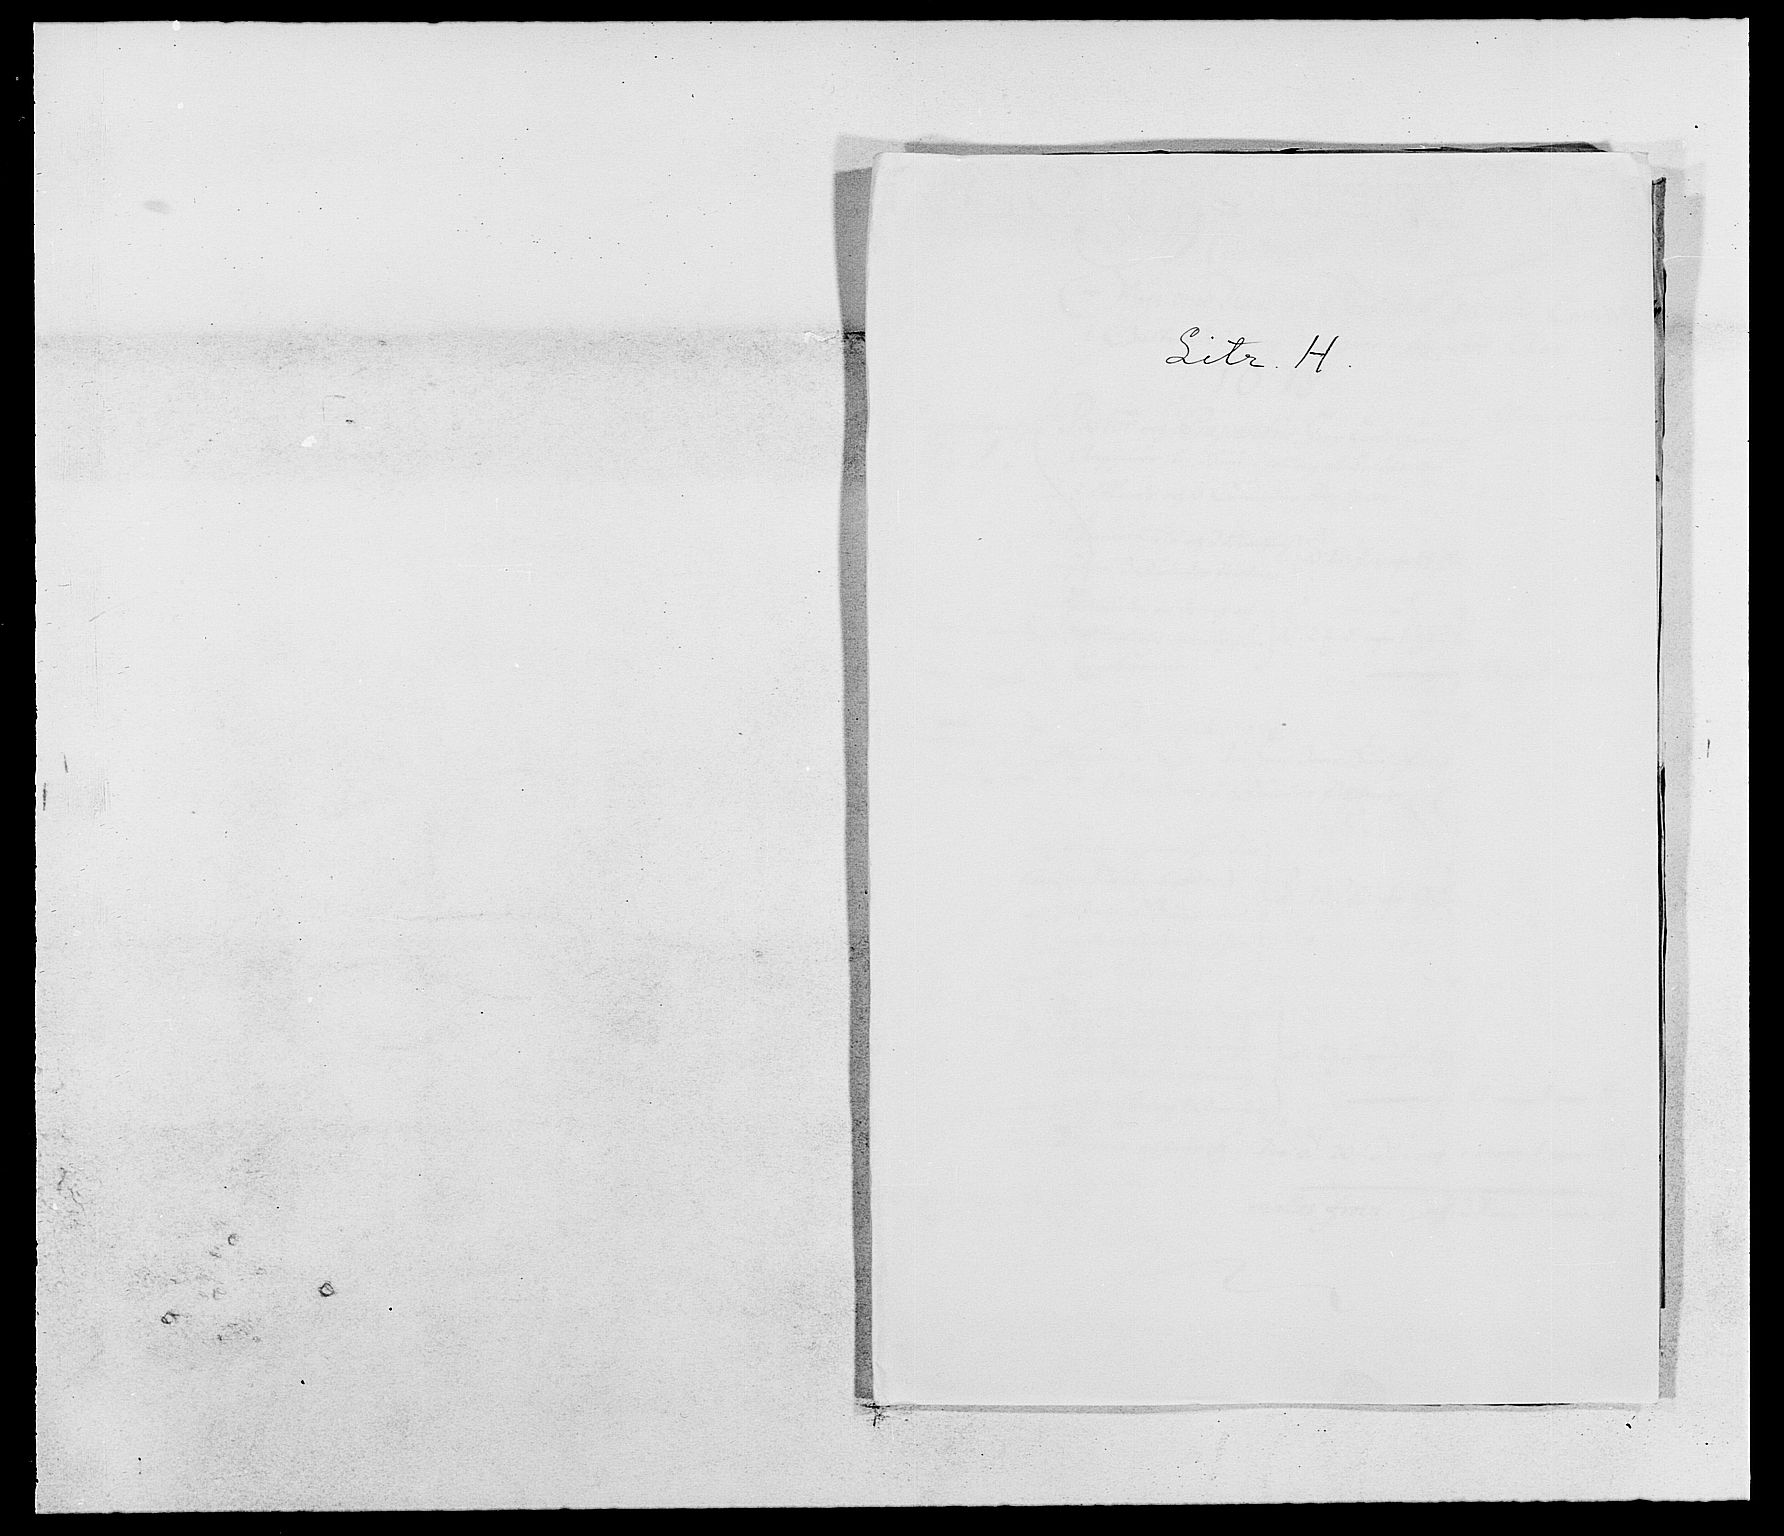 RA, Rentekammeret inntil 1814, Reviderte regnskaper, Fogderegnskap, R17/L1152: Fogderegnskap Gudbrandsdal, 1678-1679, s. 313